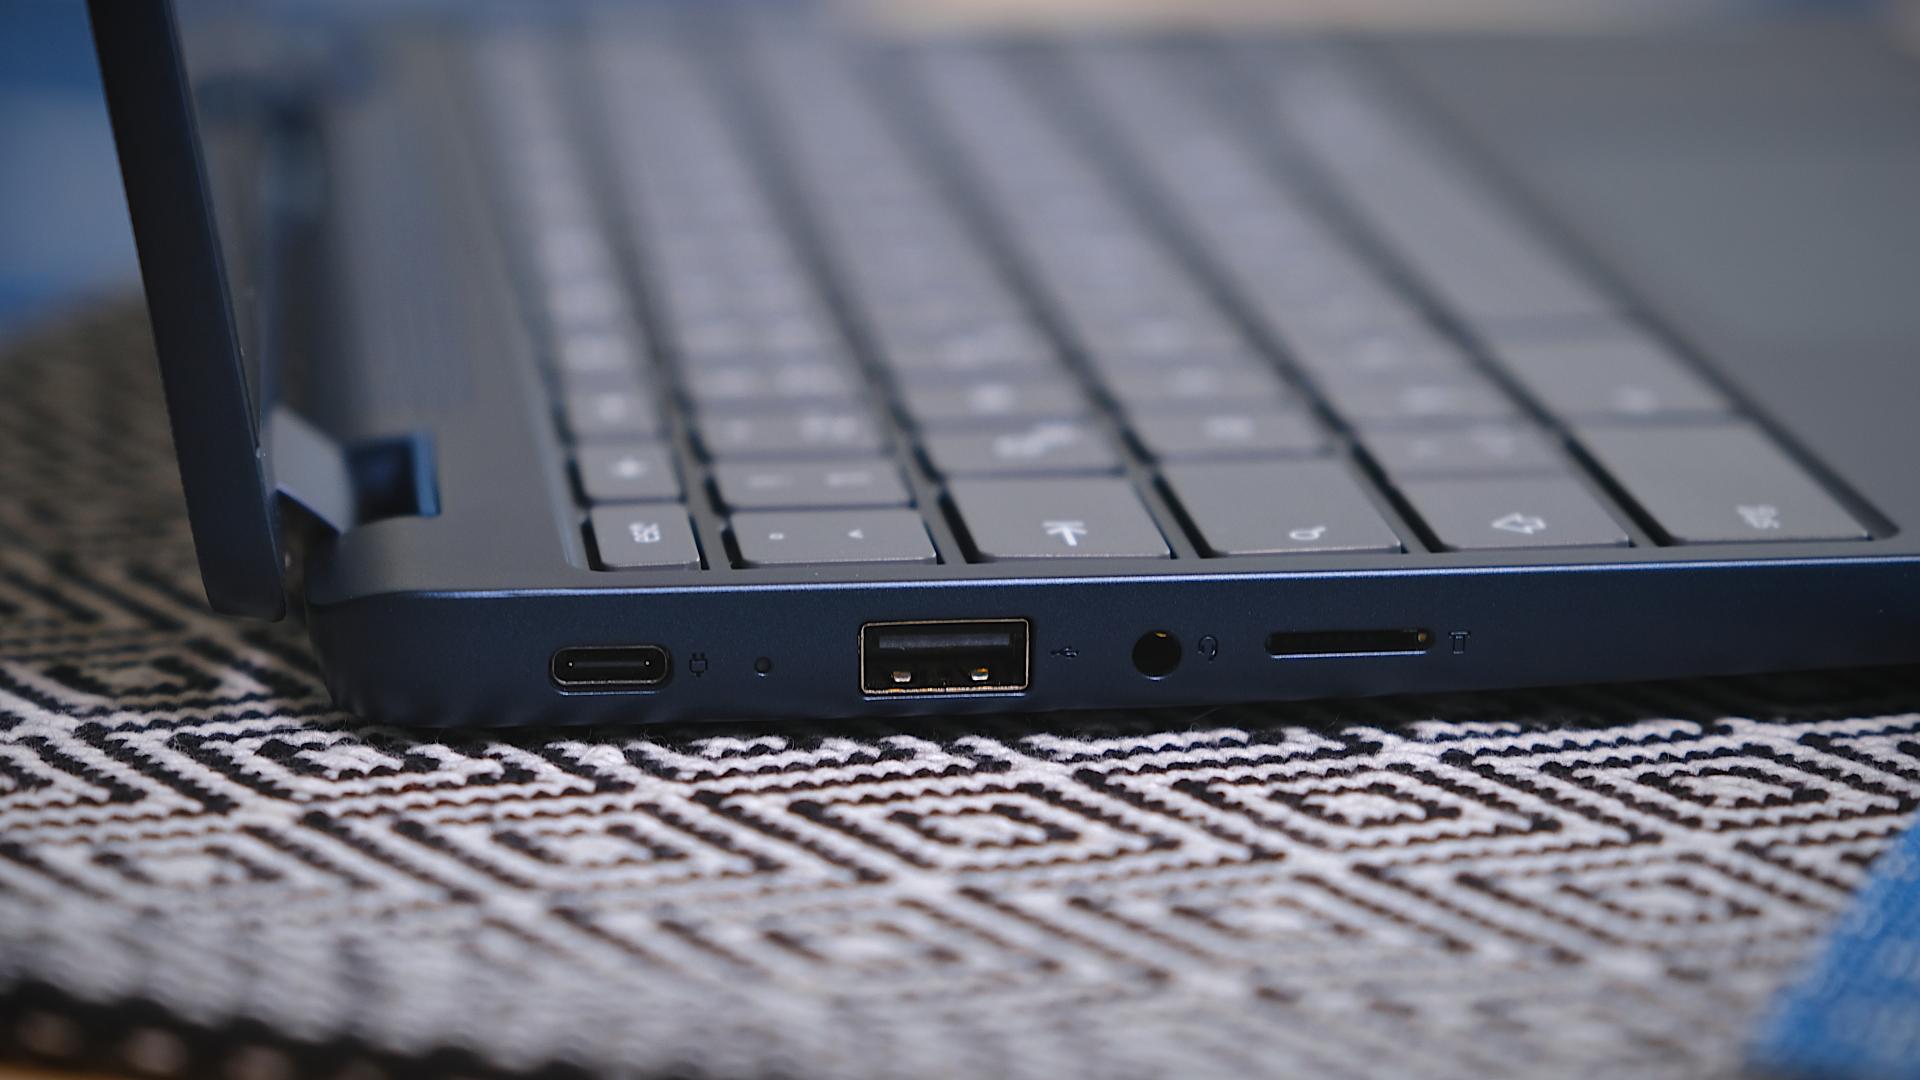 Flex 3 Chromebook ports